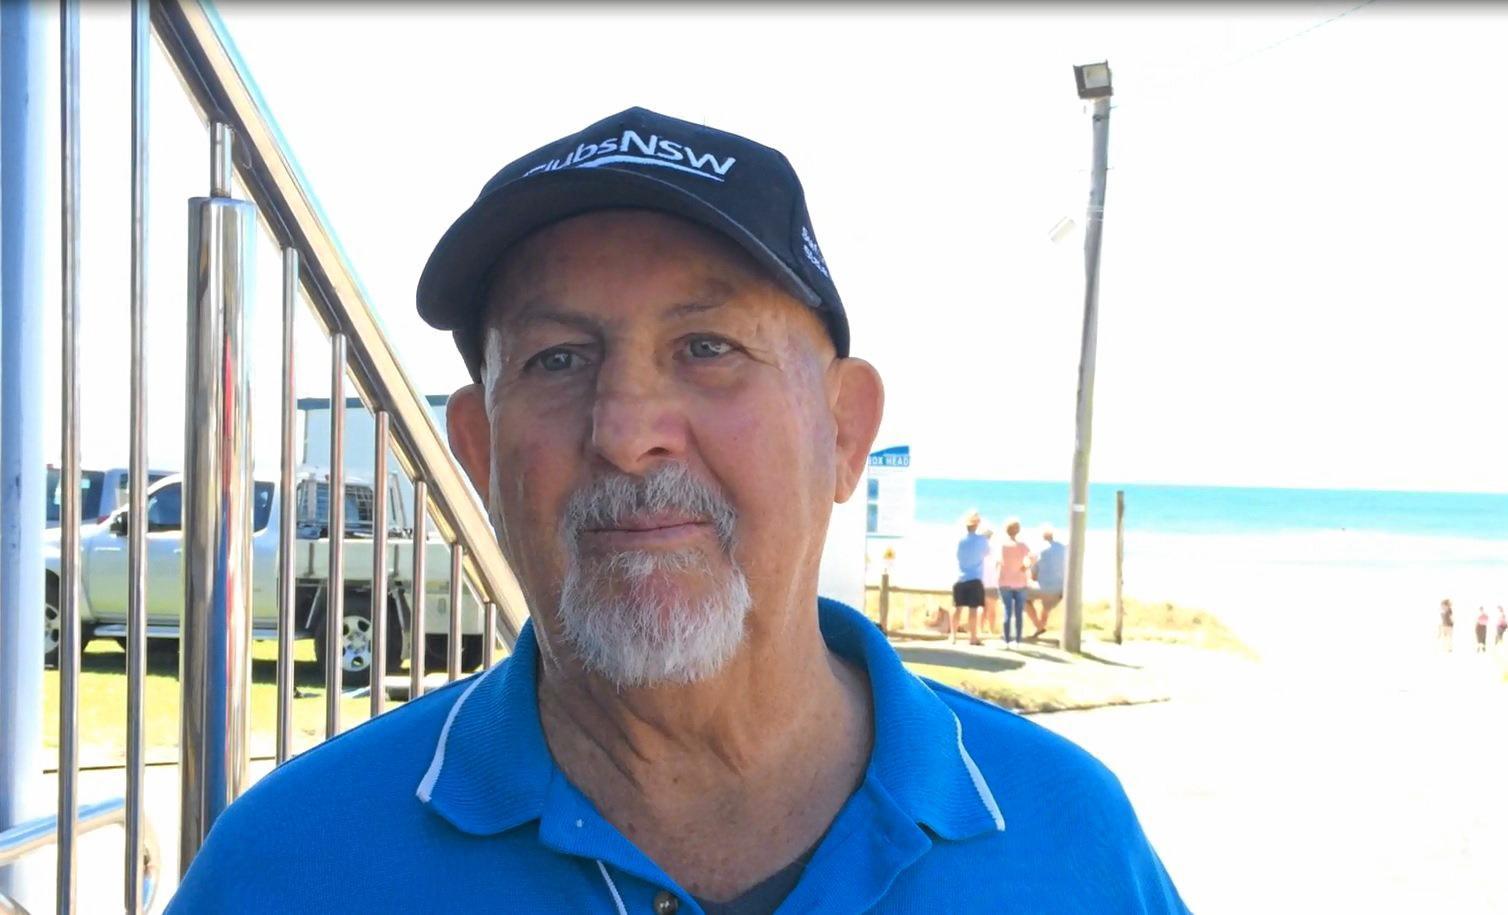 President of the Lennox Head-Alstonville Surf Life Saving Club Geoff Harris